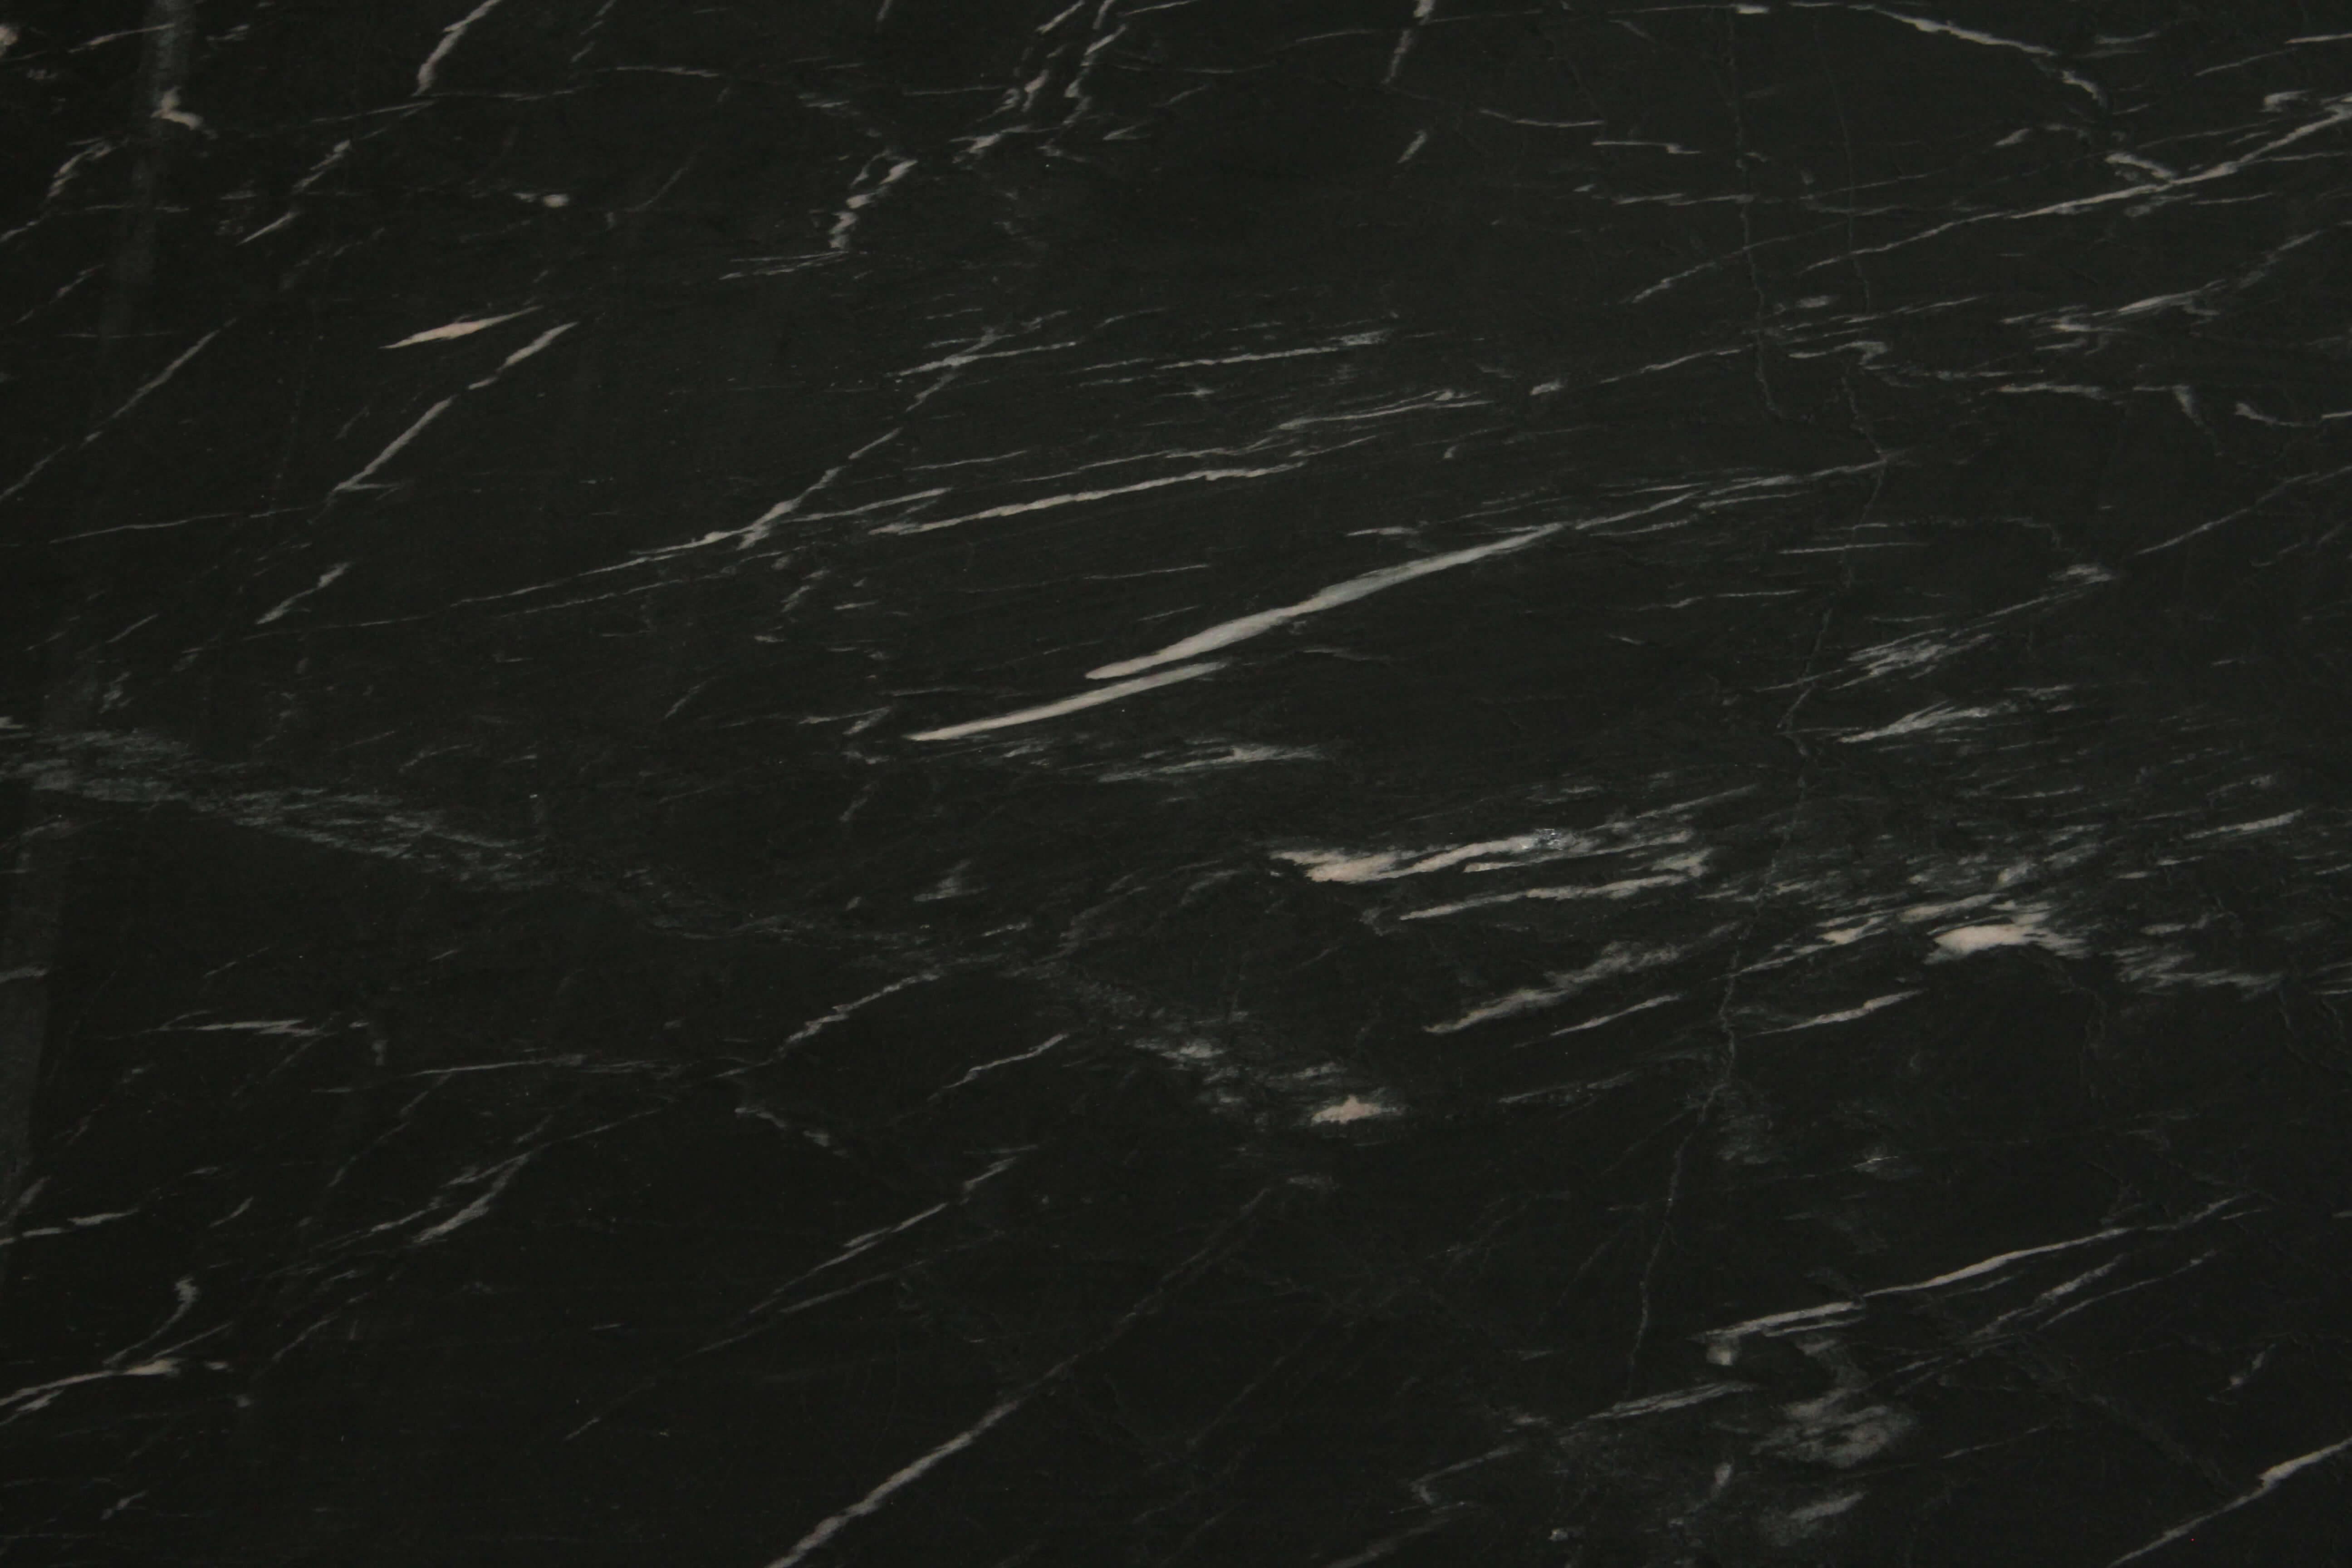 FANTASTIC BLACK фото 1 — камень от Bevers Marmyr